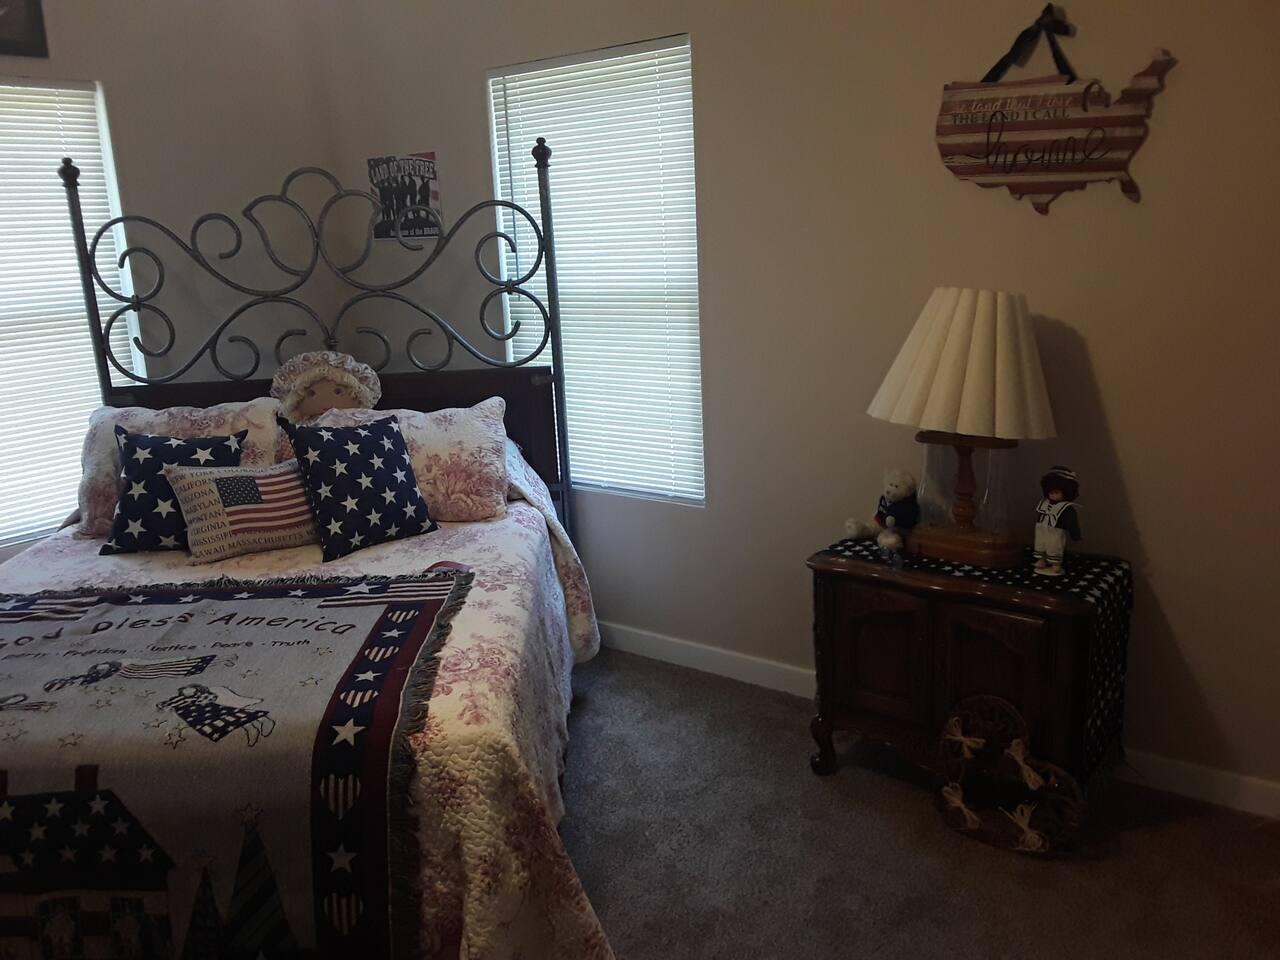 The Patriotic bedroom